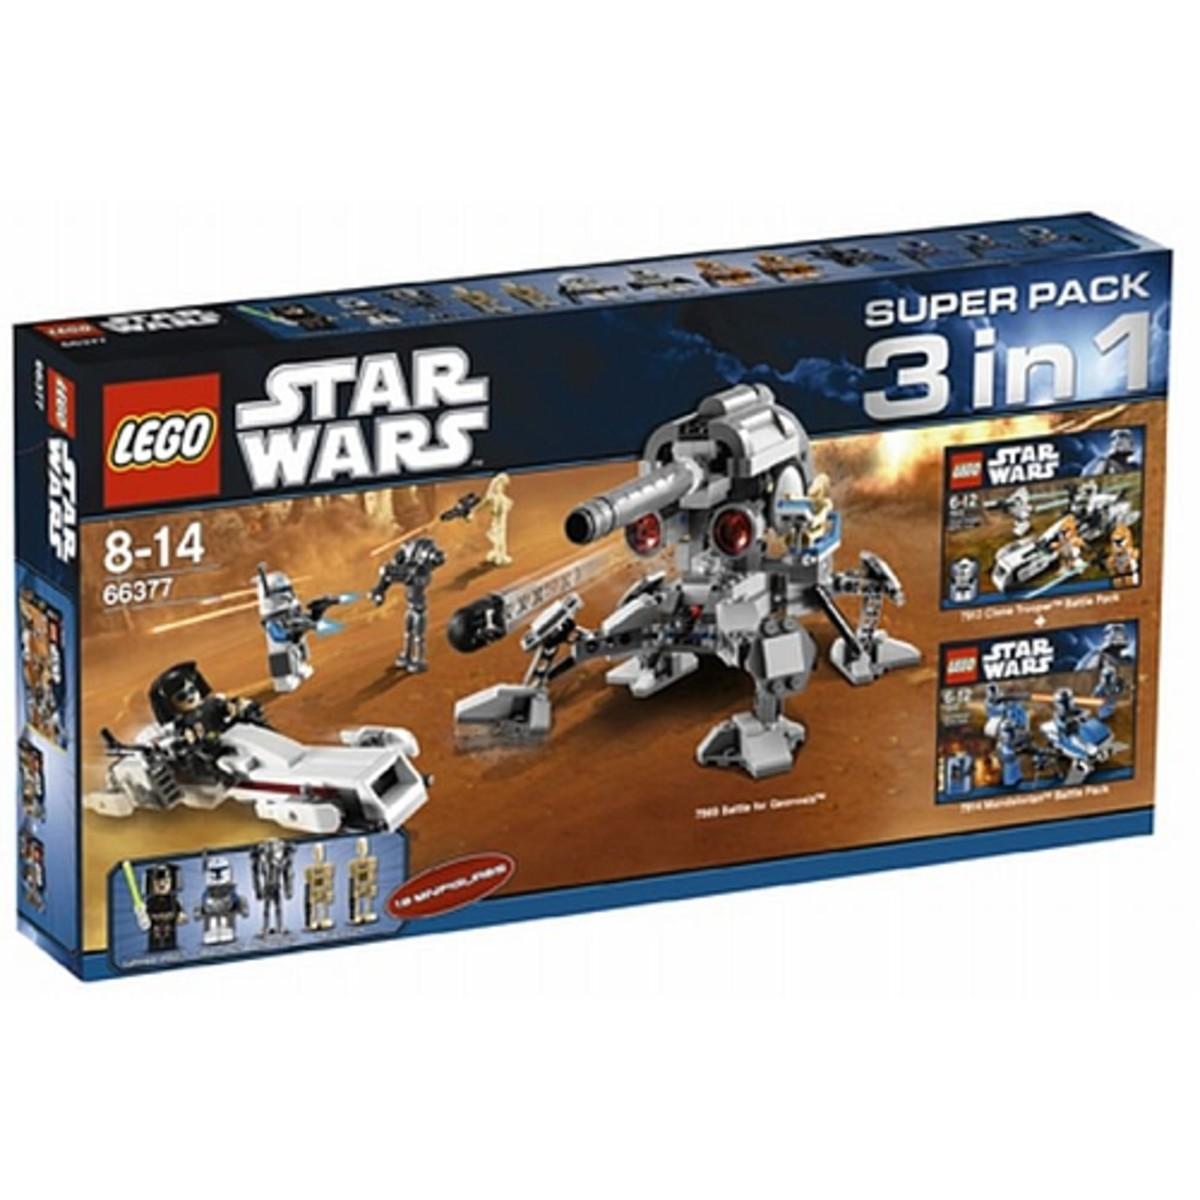 LEGO Star Wars 3 in 1 Super Pack # 66377 Box